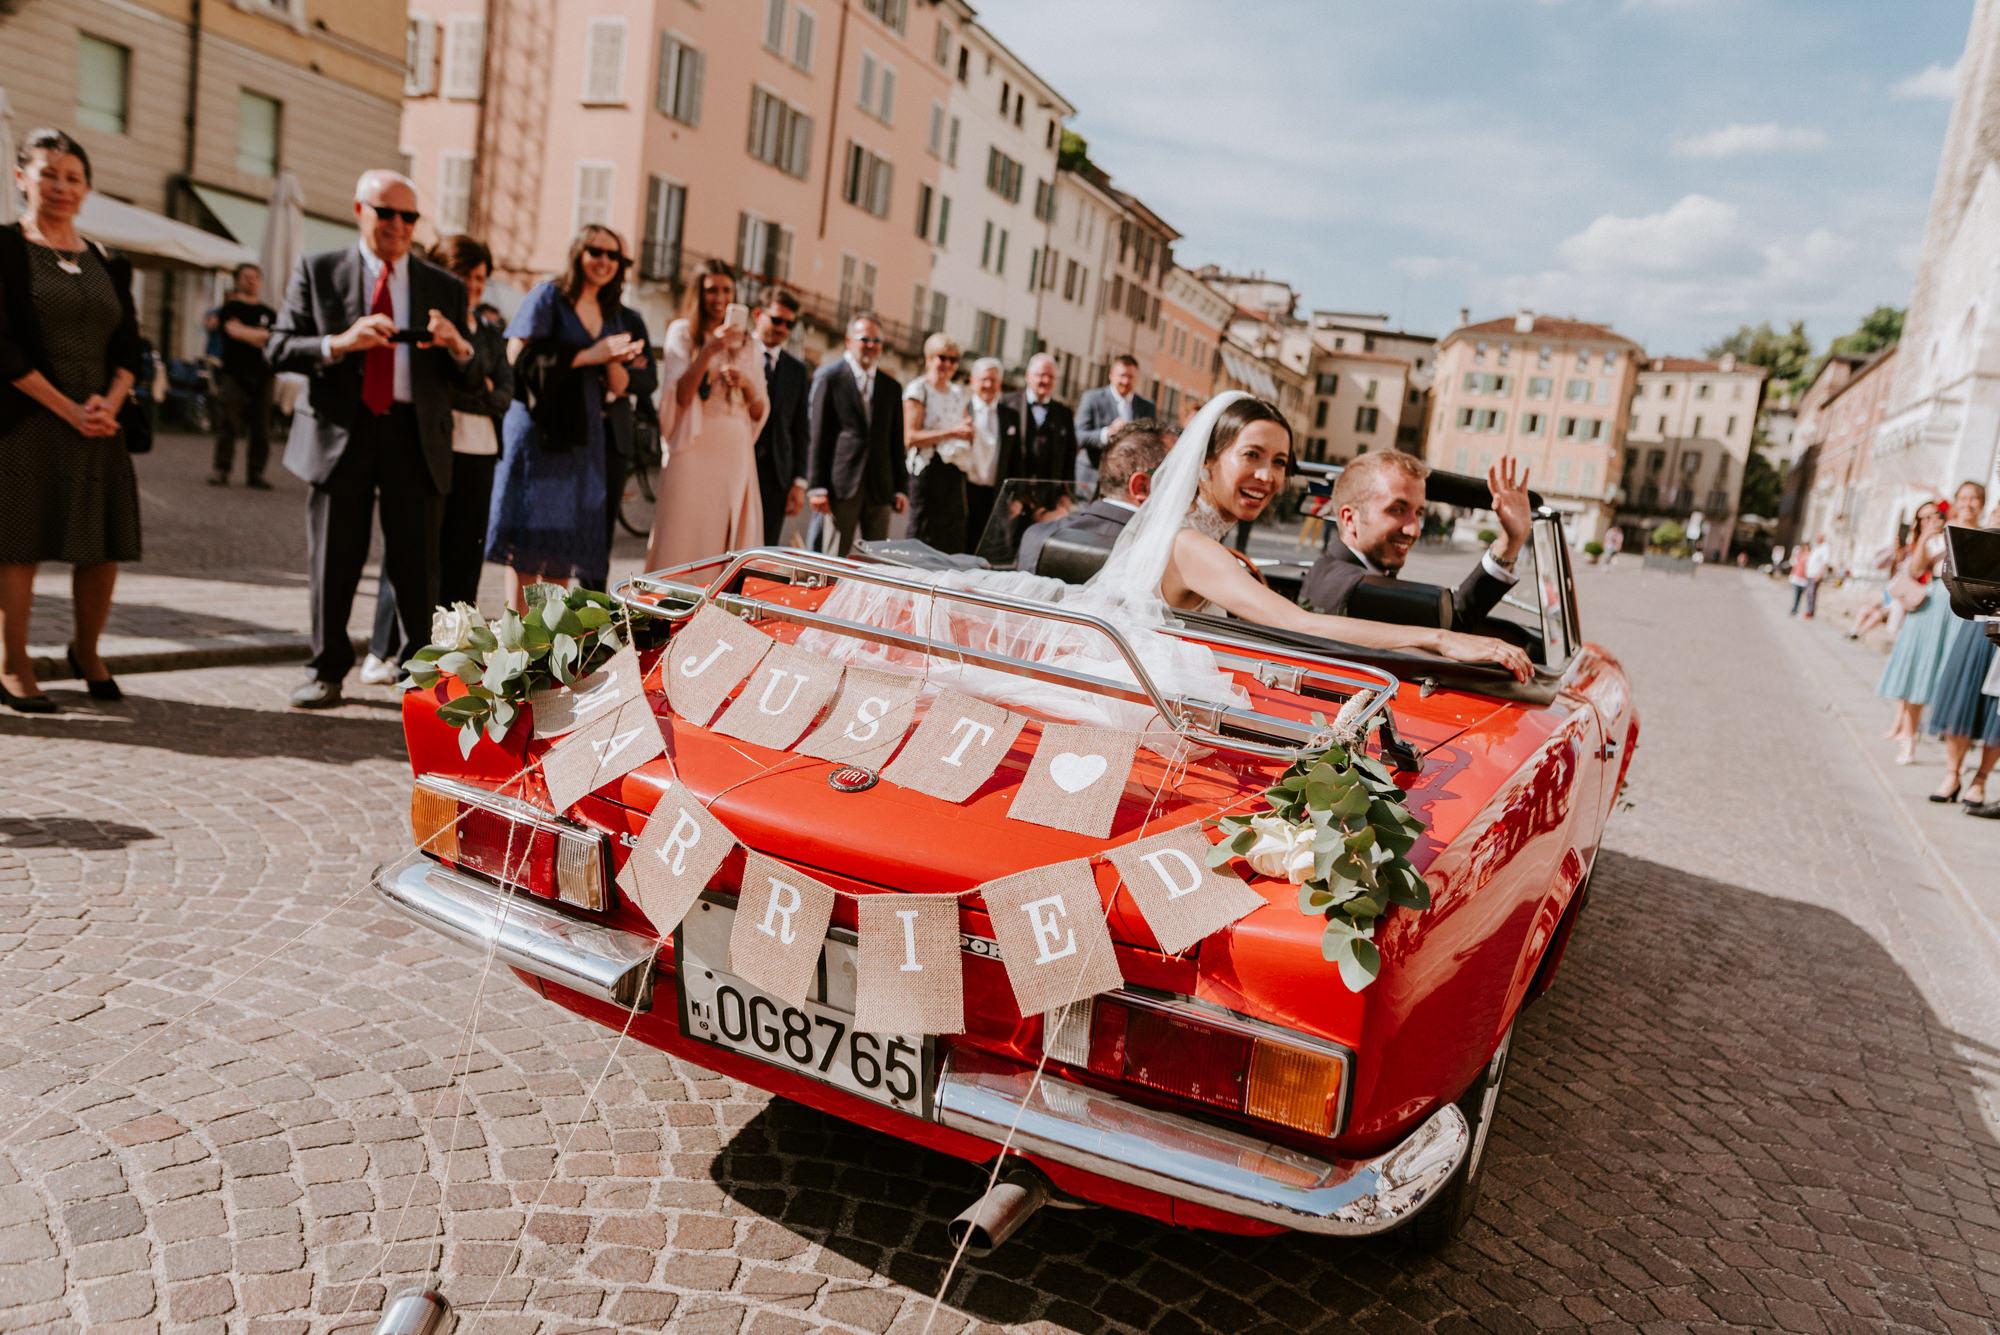 FOTO+PHOTO+BODA+WEDDING+ITALIA+ITALY+MAURICIO+GARAY+MAURICIOGARAY+WEDDINPHOTOGRAPHER+FOTOGRAFODEBODA-1138.jpg